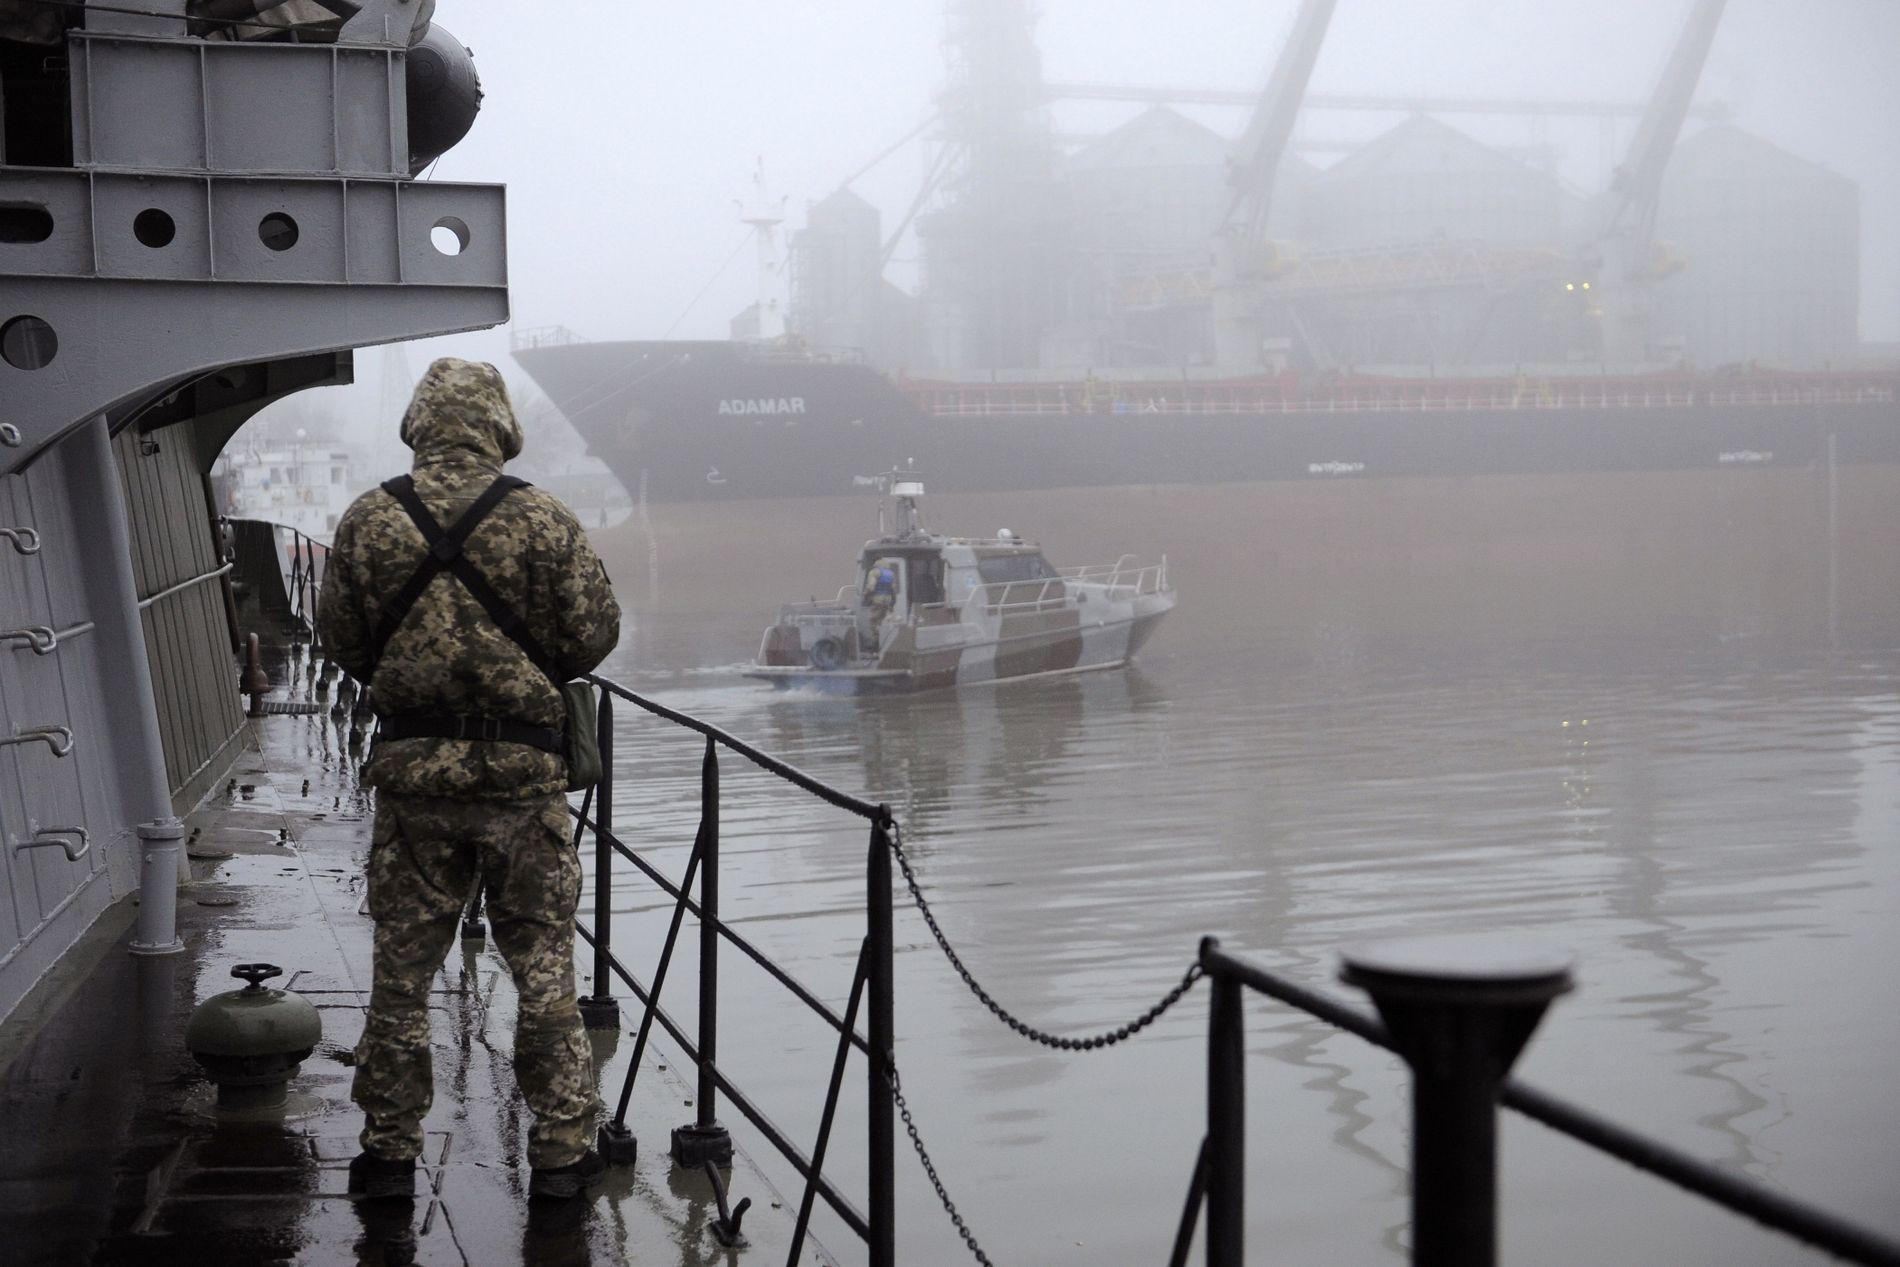 FLERE SOLDATER: Ukrainsk soldat står vakt om bord på militærbåten «Dondass» som ligger fortøyd i Mariupol.